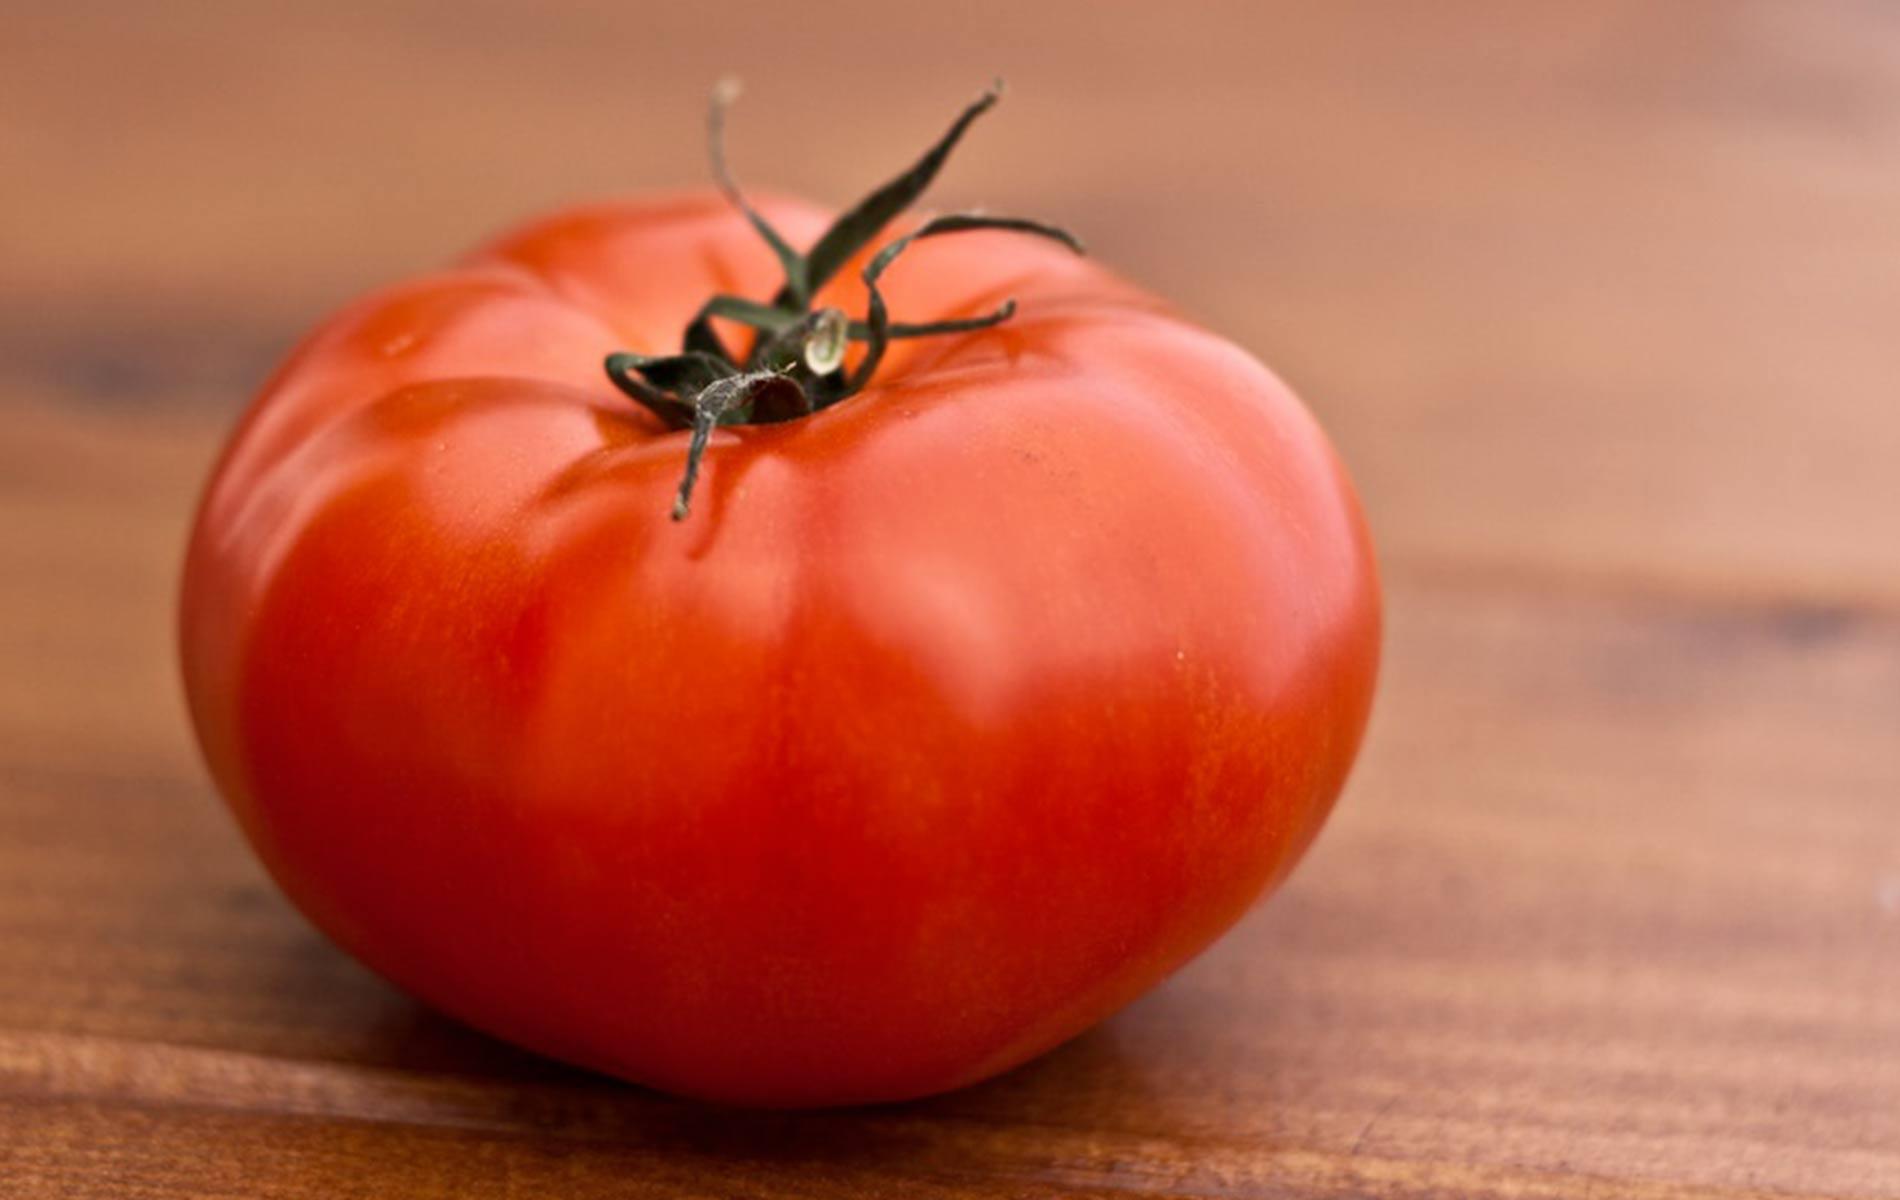 pomodoro-castellano-storia